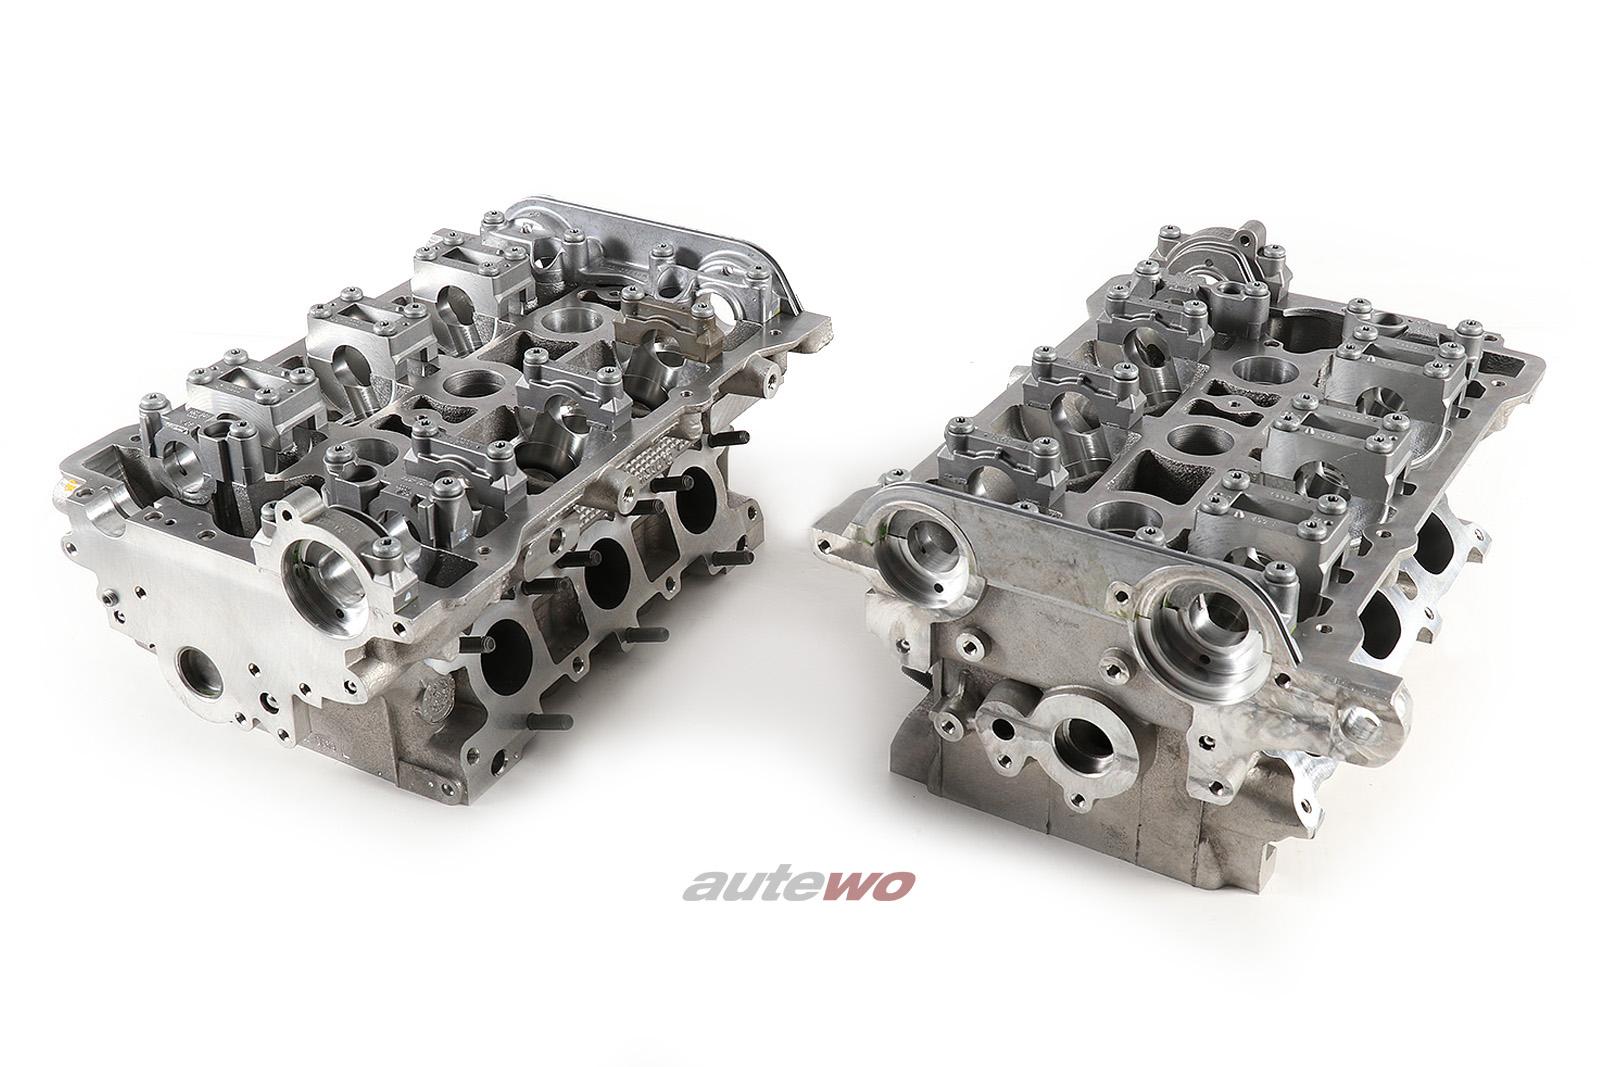 NEU Audi S4 B5/A6 2.7l Biturbo Set Zylinderköpfe NG Motorsports CNC-Bearbeitung